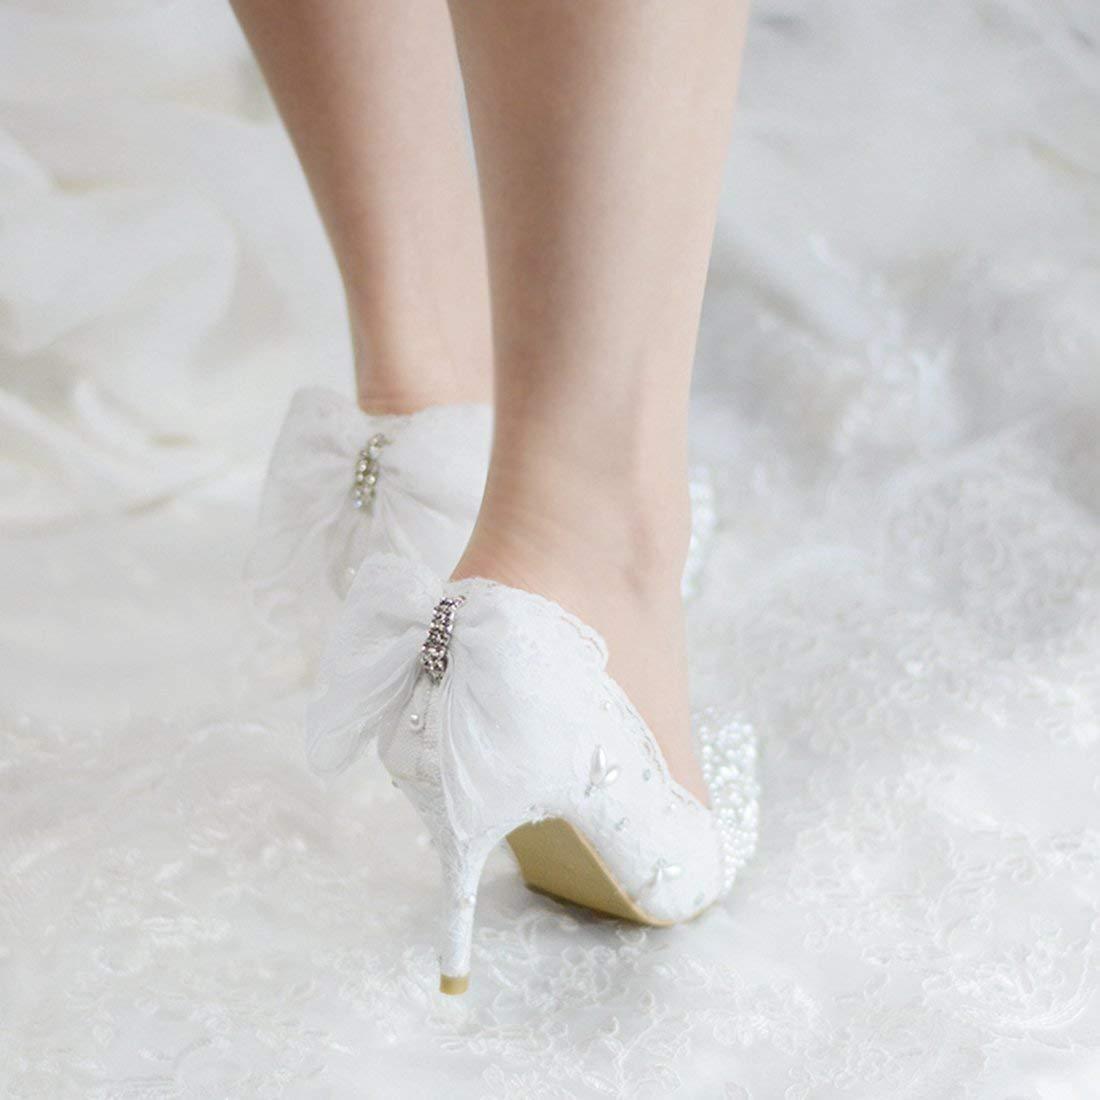 Qiusa Frauen zurück Spitze Bowknot Perlen weiß besonderen besonderen besonderen Anlass Braut Hochzeit Pumps UK 4 (Farbe   -, Größe   -) 9b32f5